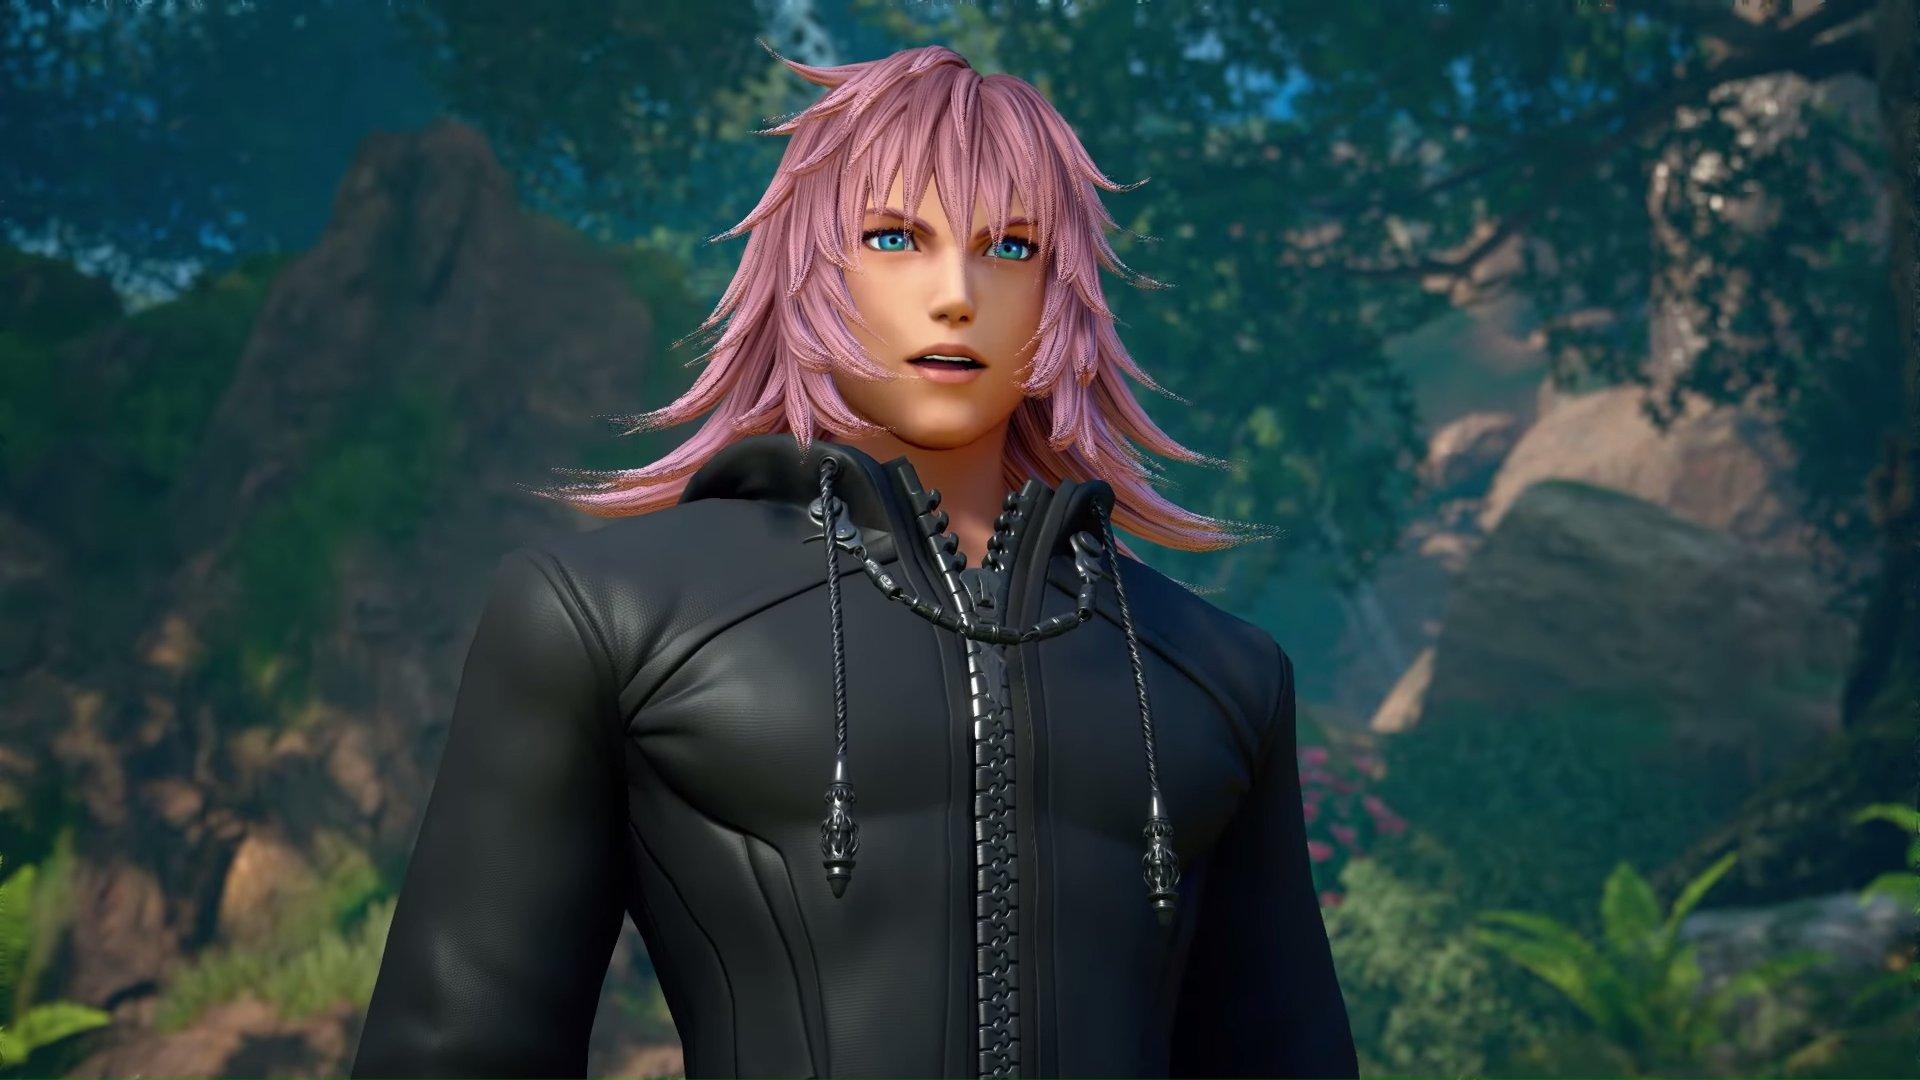 Kingdom Hearts 3, III, Square Enix, PS4, Playstation 4, Marluxia, Organization XIII, 13